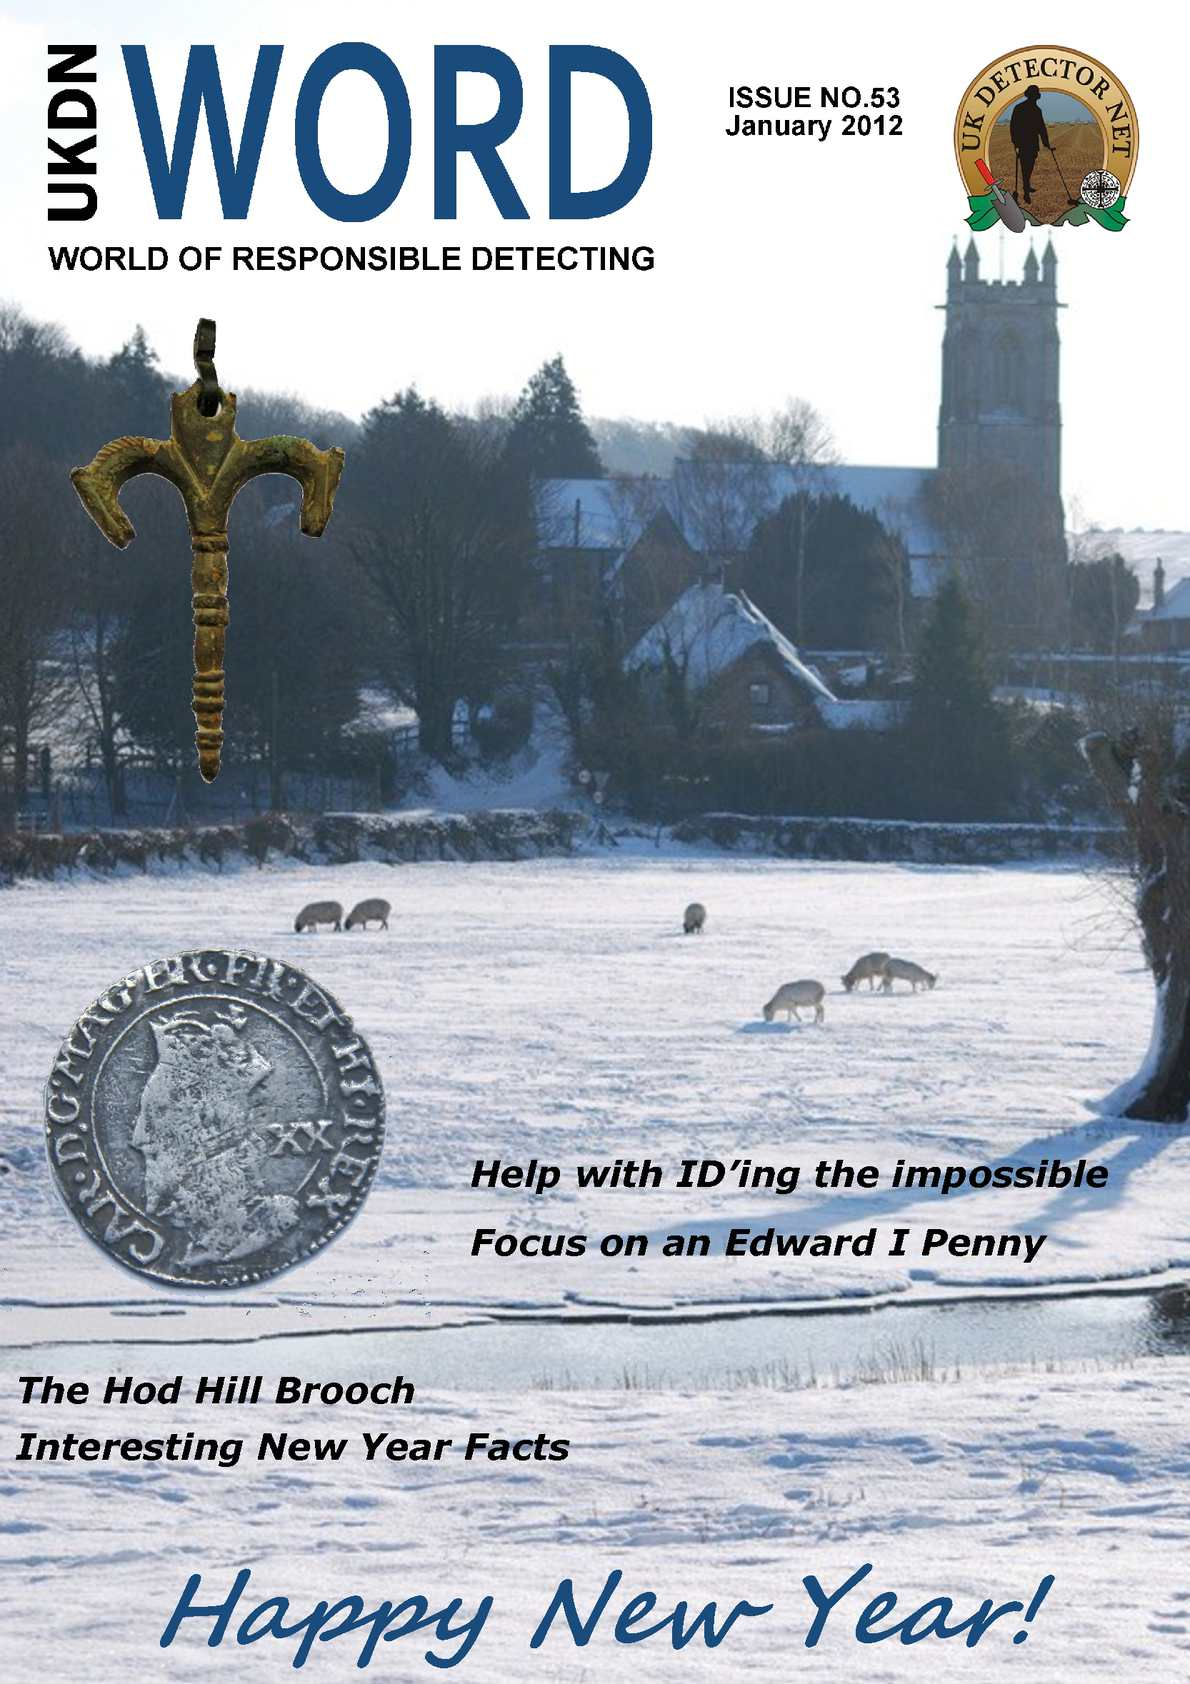 UKDN Word Issue 53 January 2012